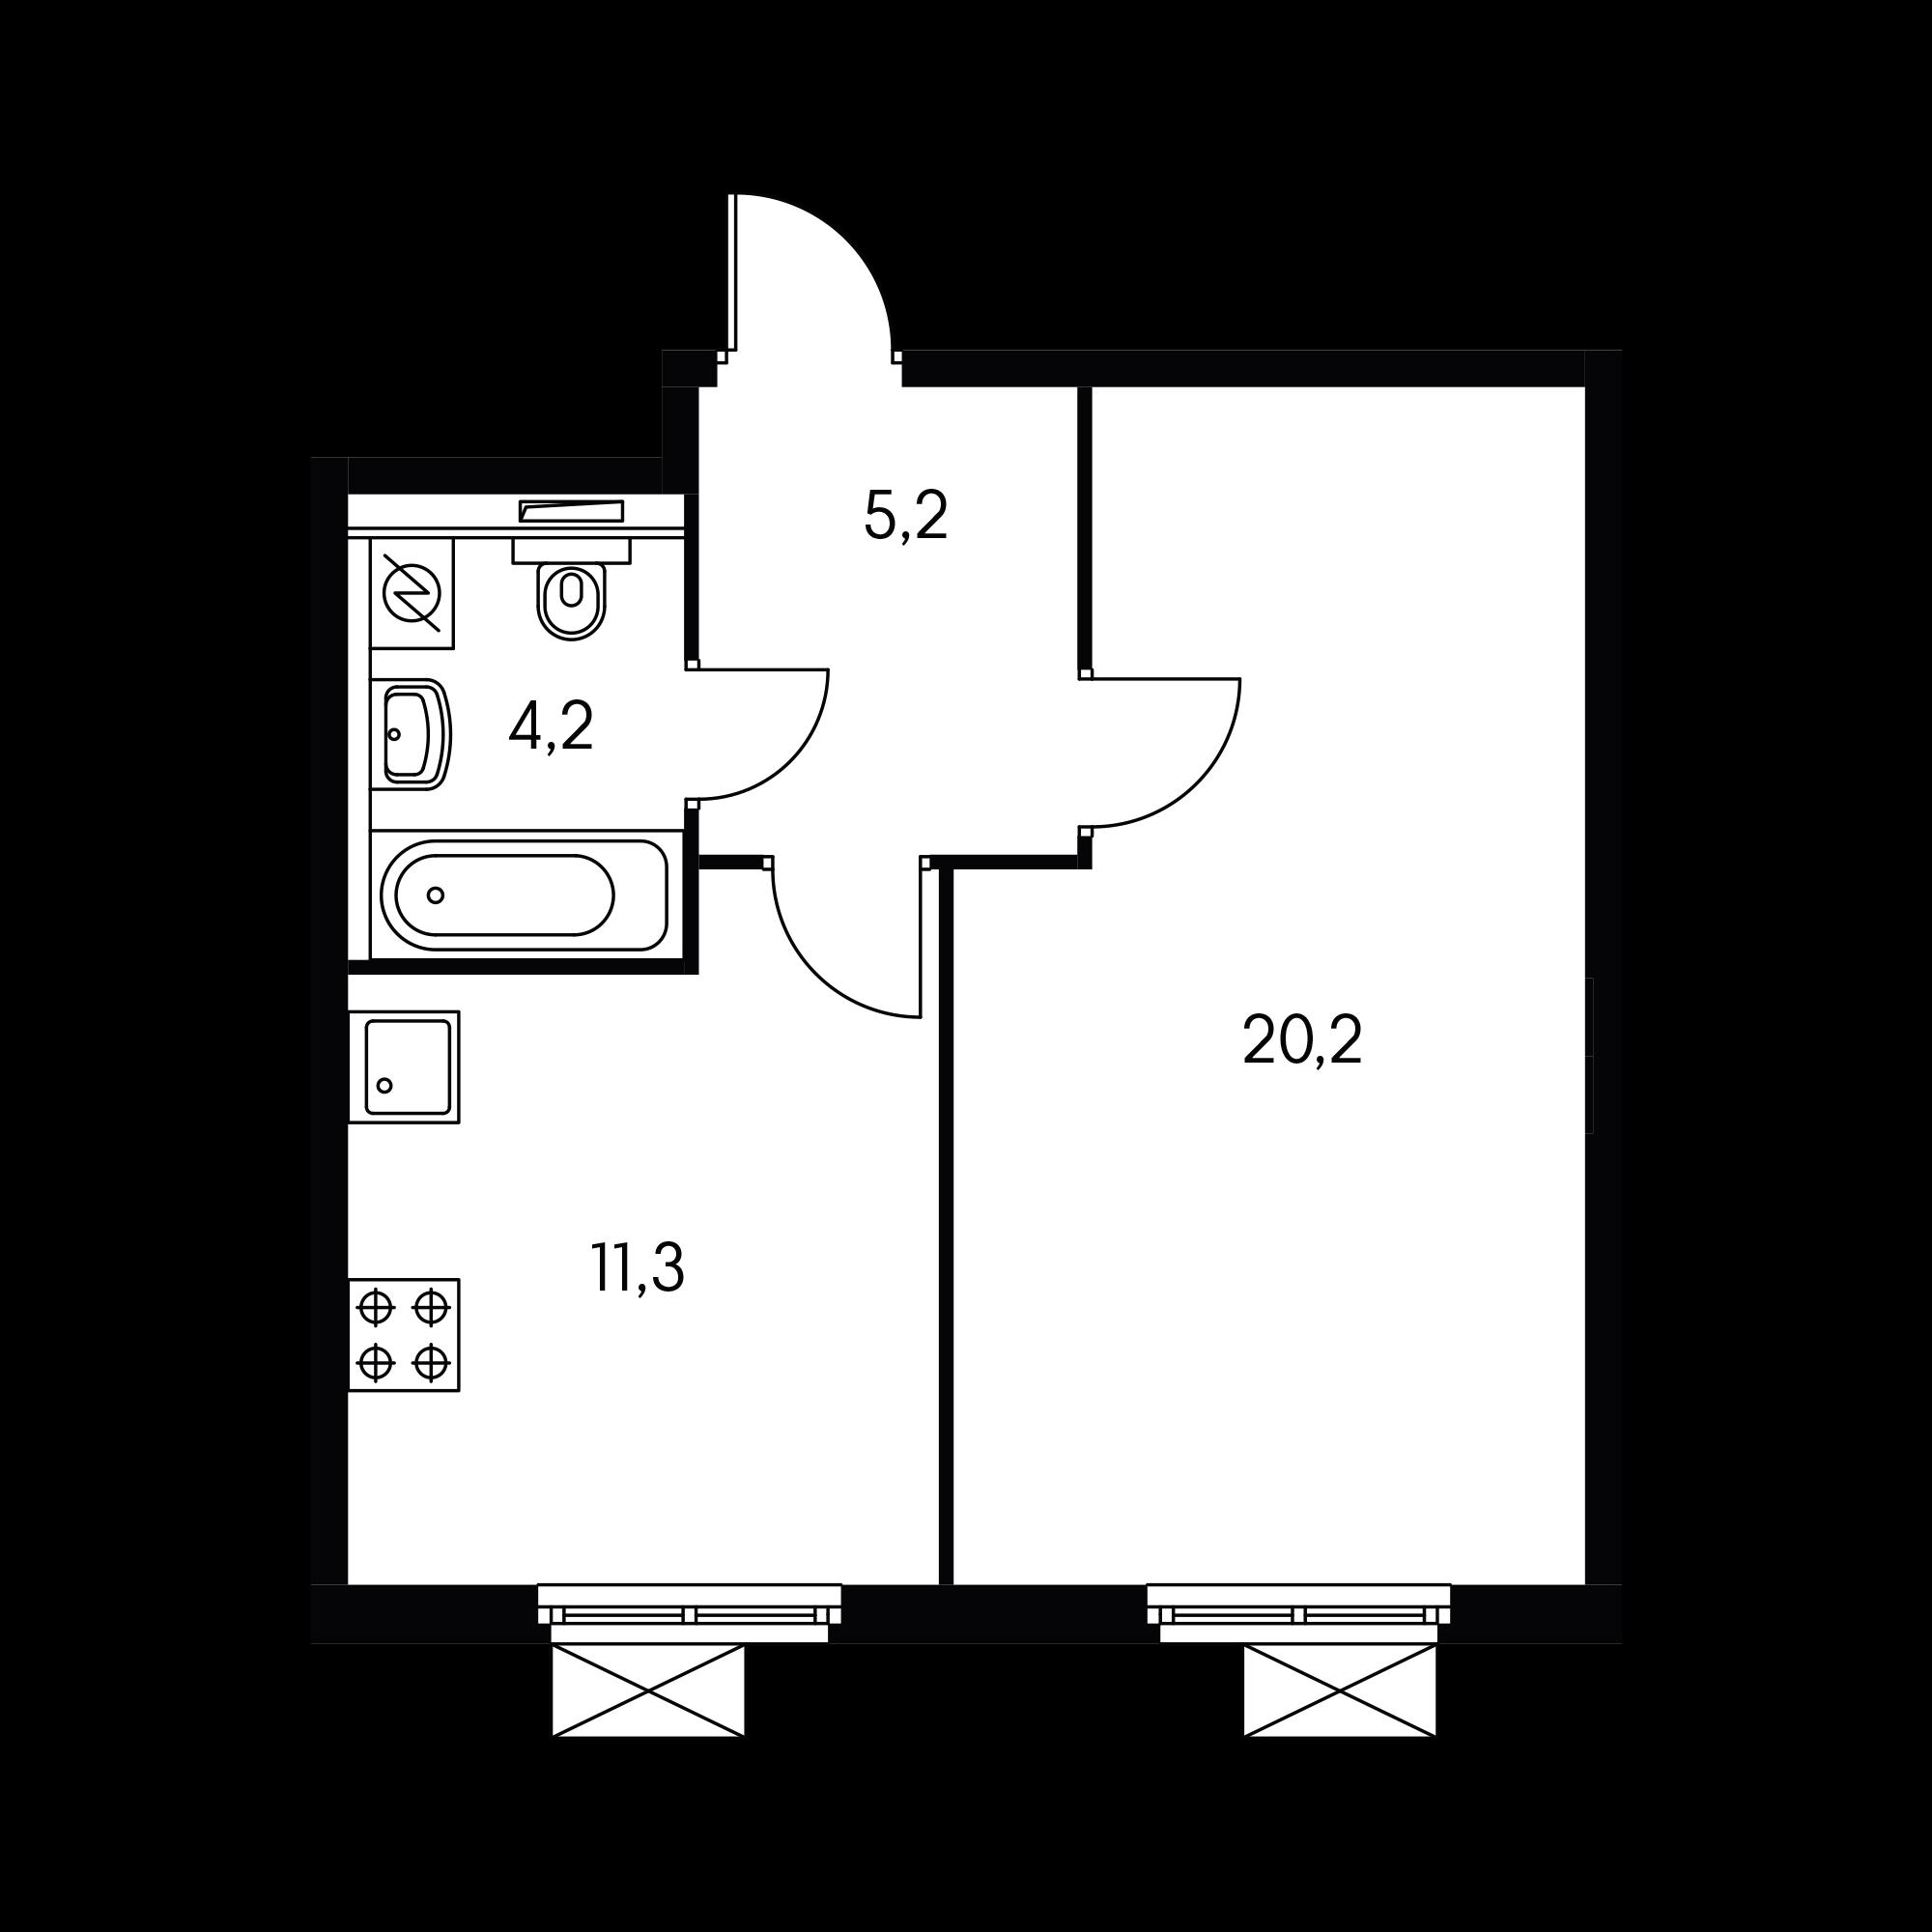 1KM1_6.9-2